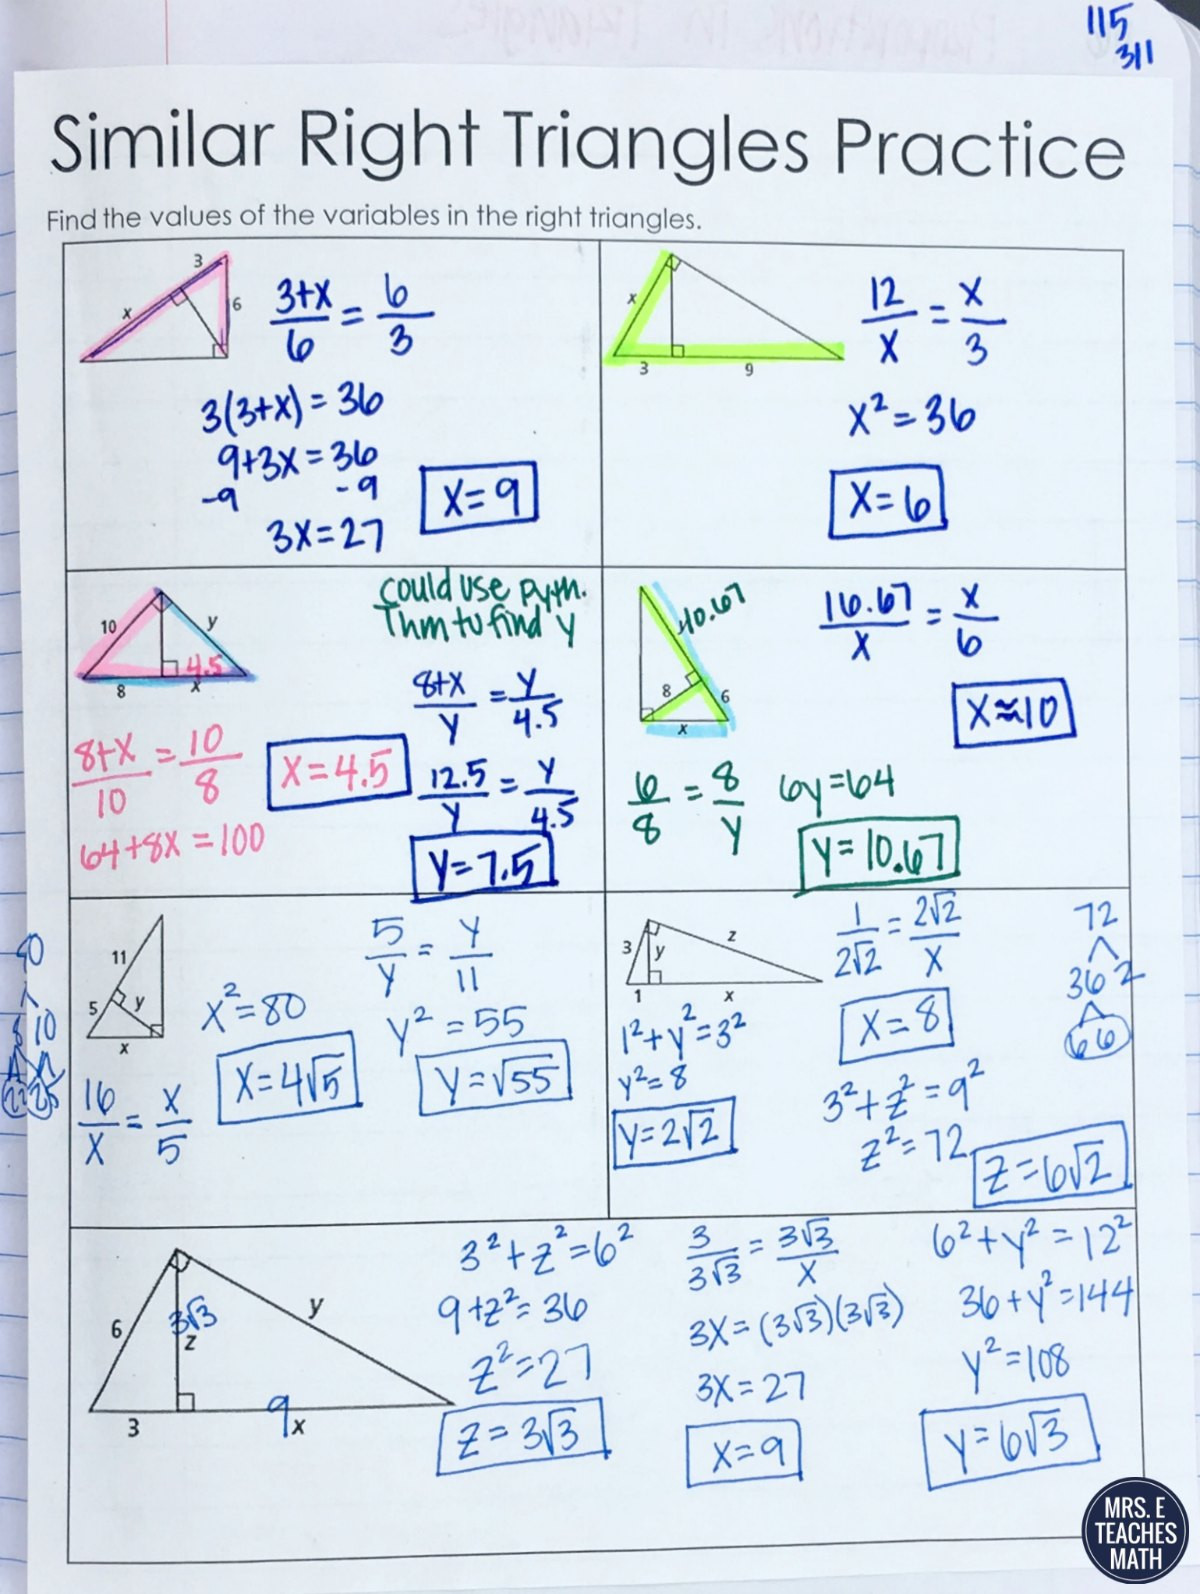 Similar Figures Worksheet Answer Key Triangle Similarity Inb Pages